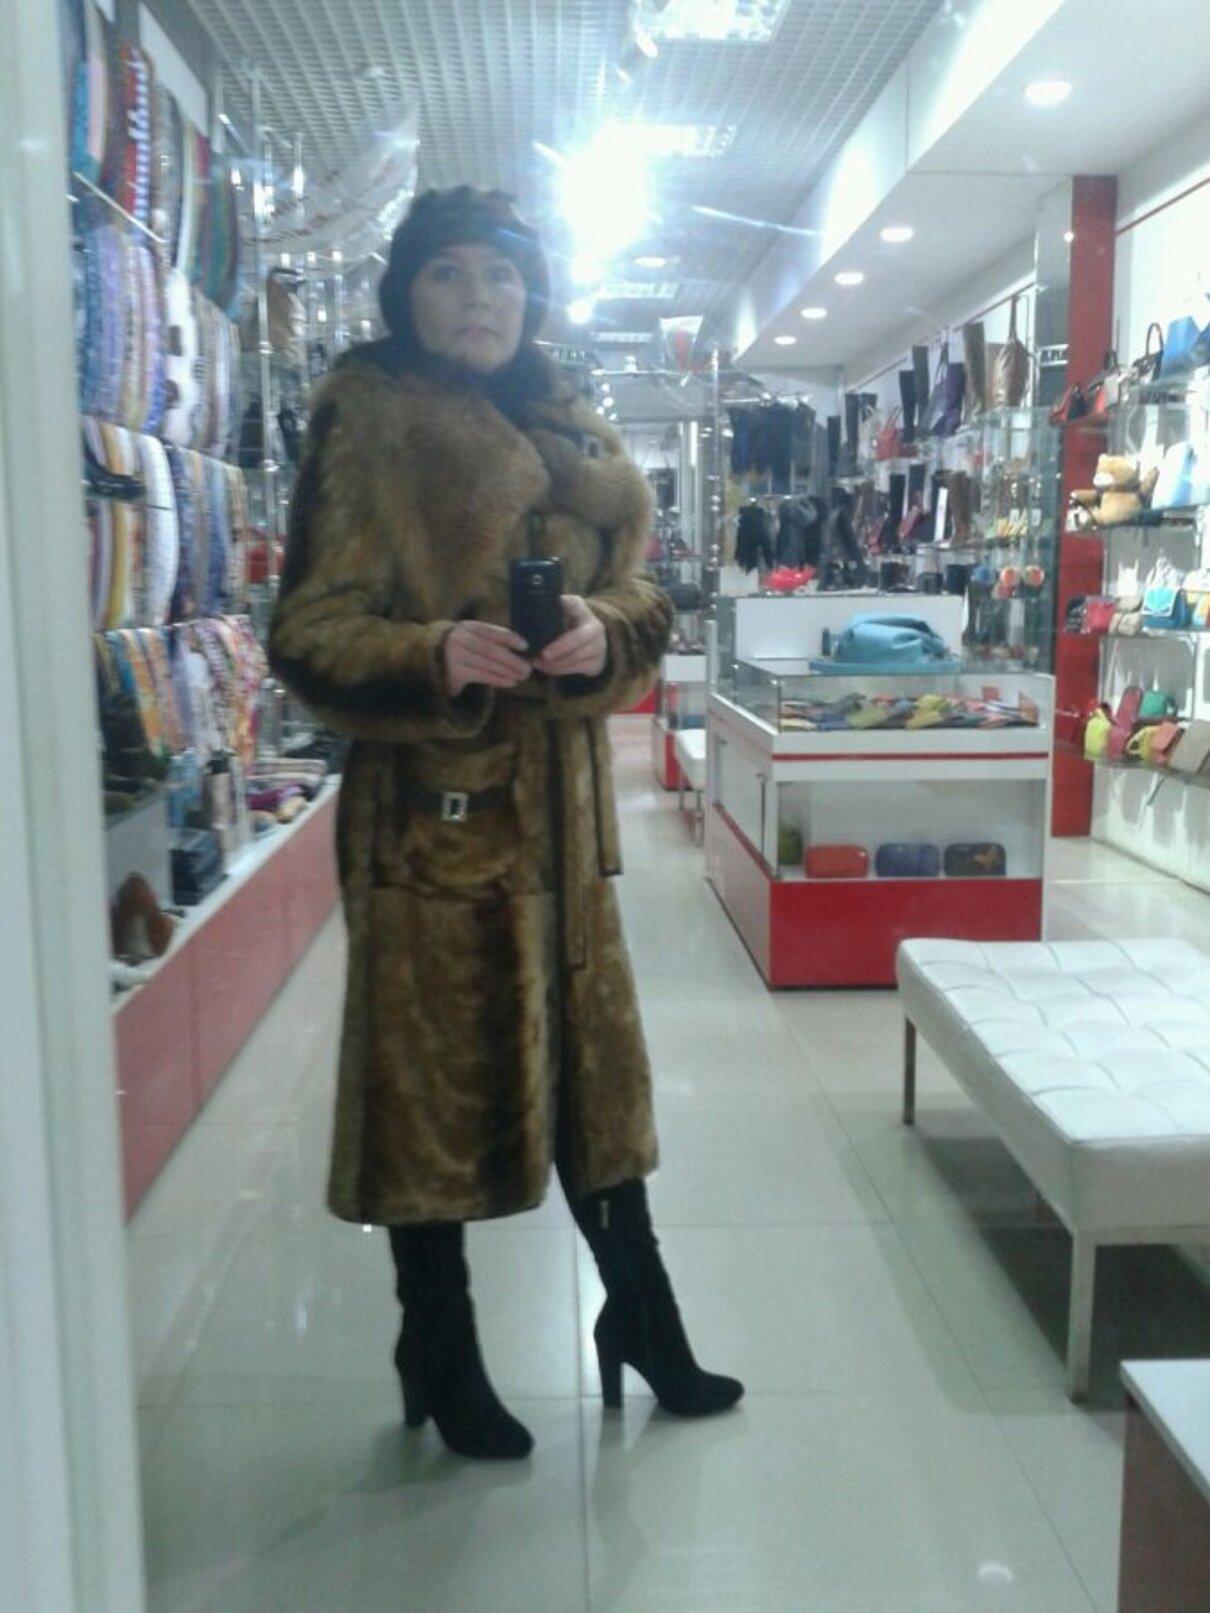 Жалоба-отзыв: Белоногова Ольга Петровна - Аферистка.  Фото №1